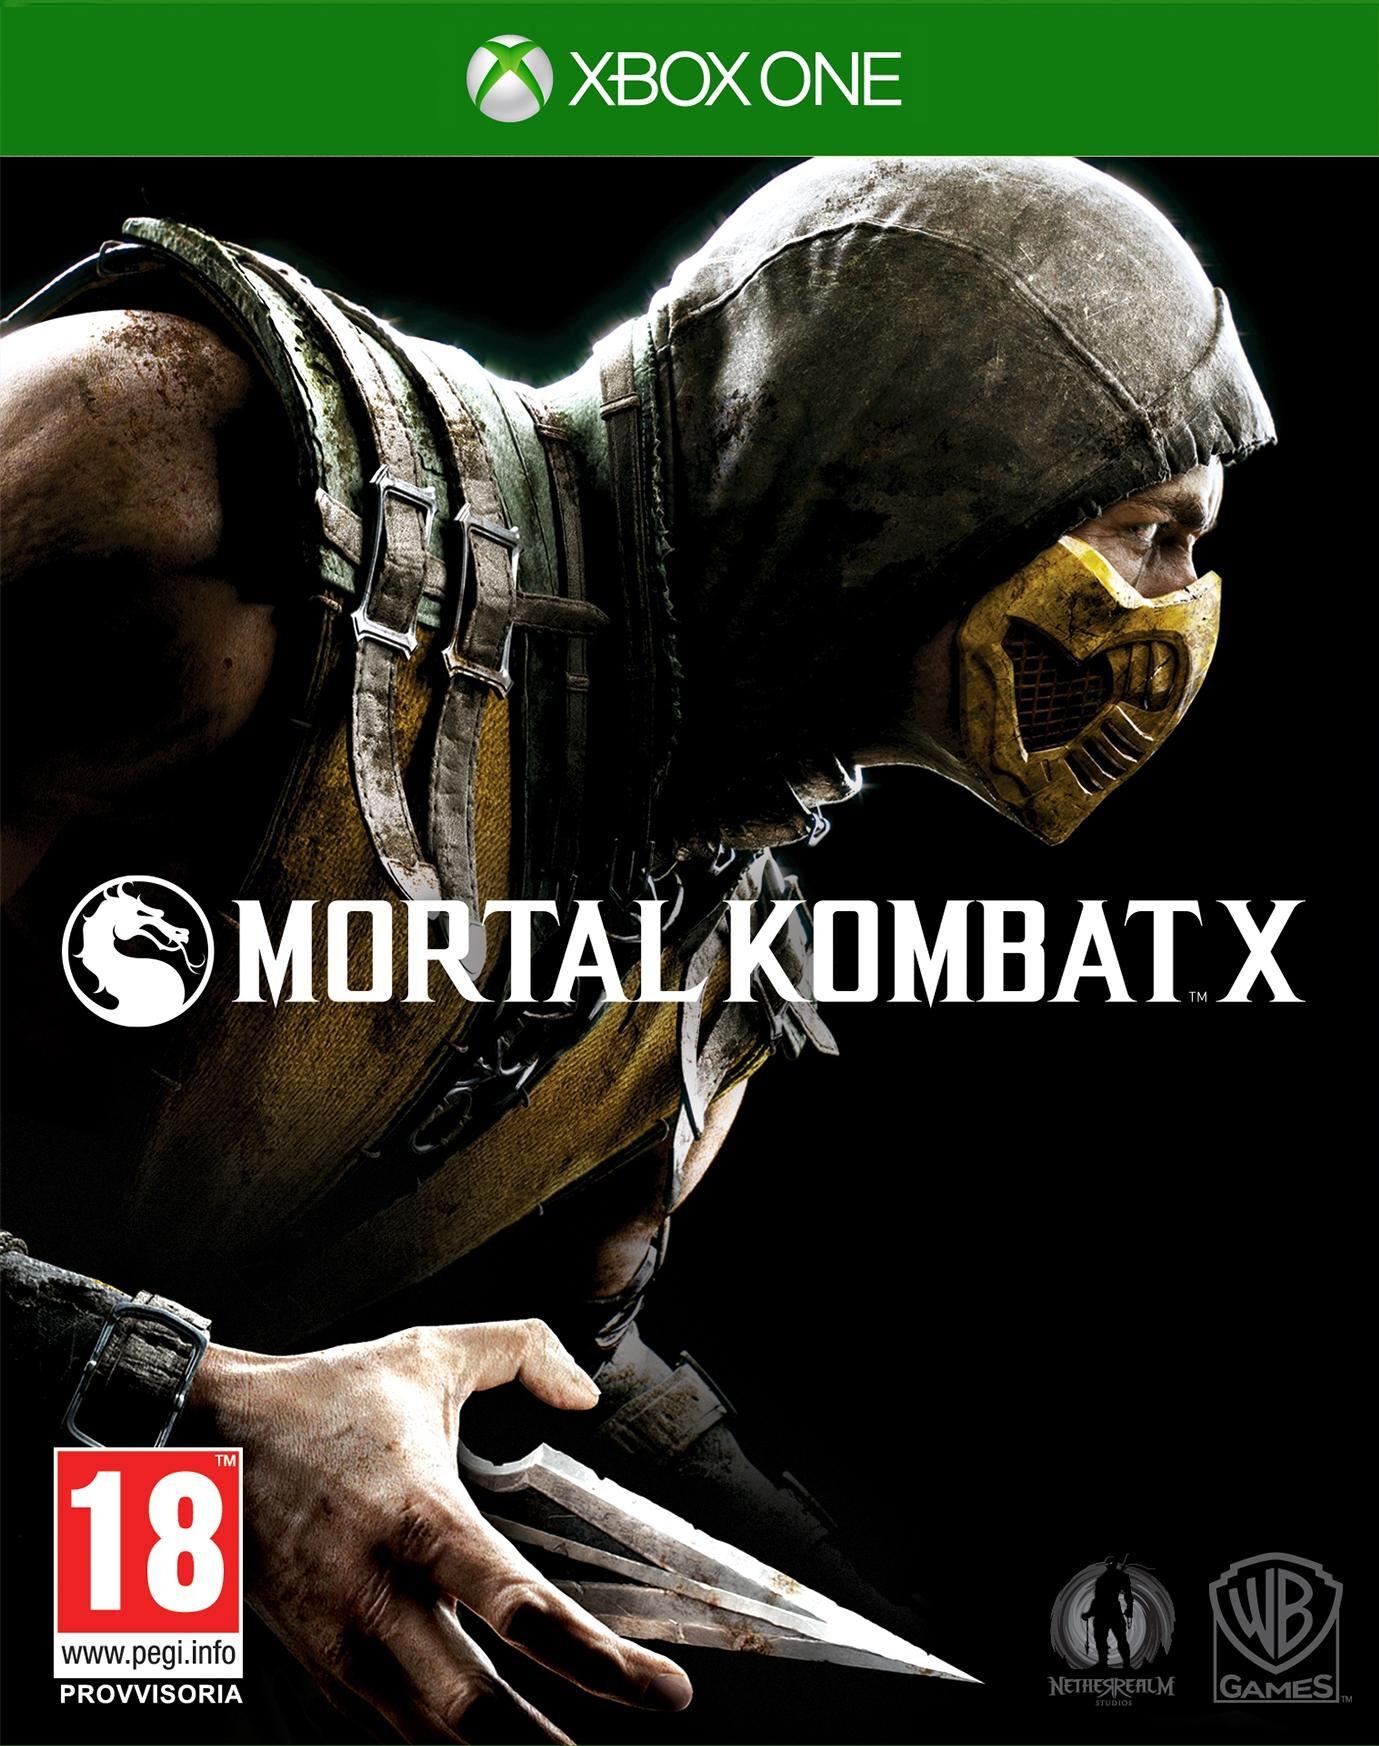 WARNER BROS.ENTERT. Warner Bros Mortal Combat X, Xbox One videogioco Basic Inglese, ITA